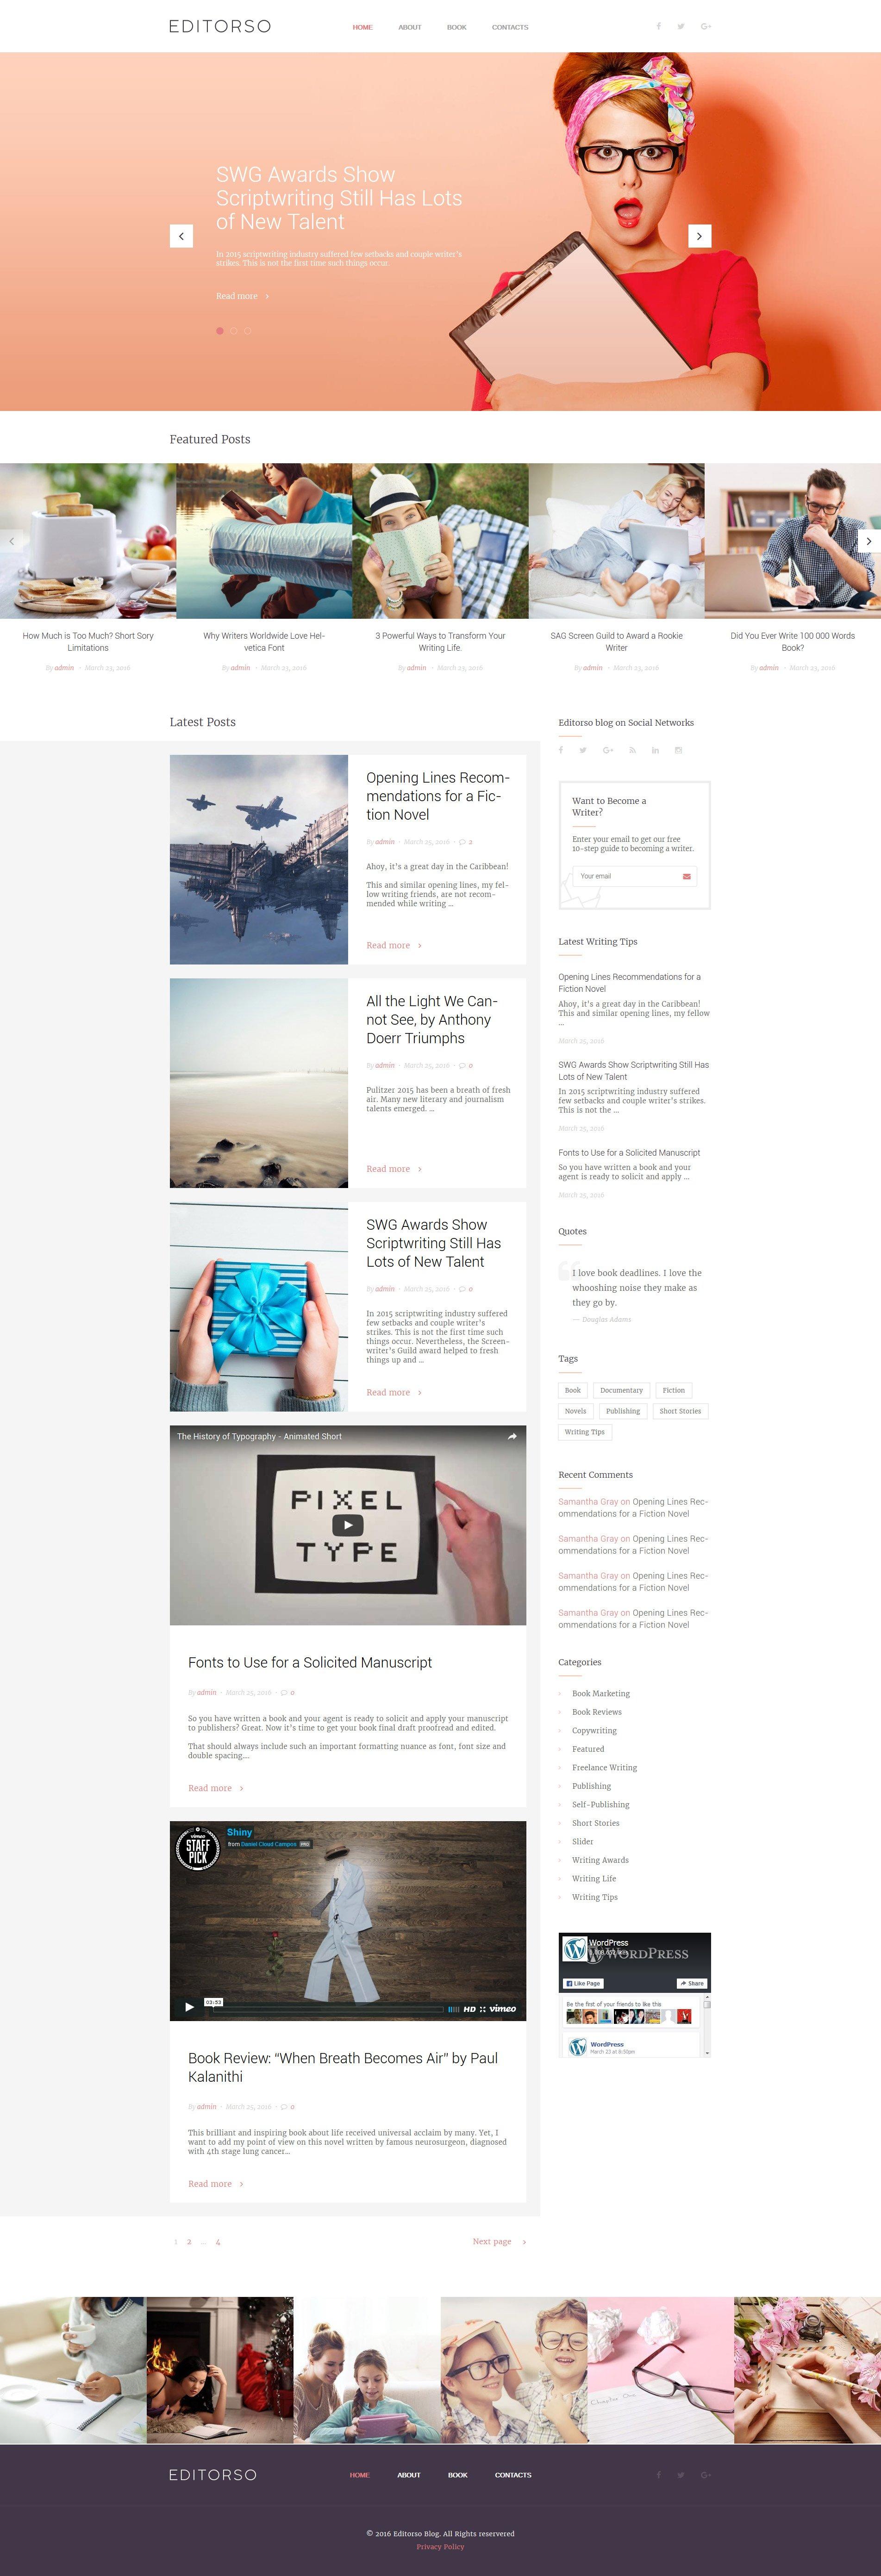 Editorso - Journalist Blog №58513